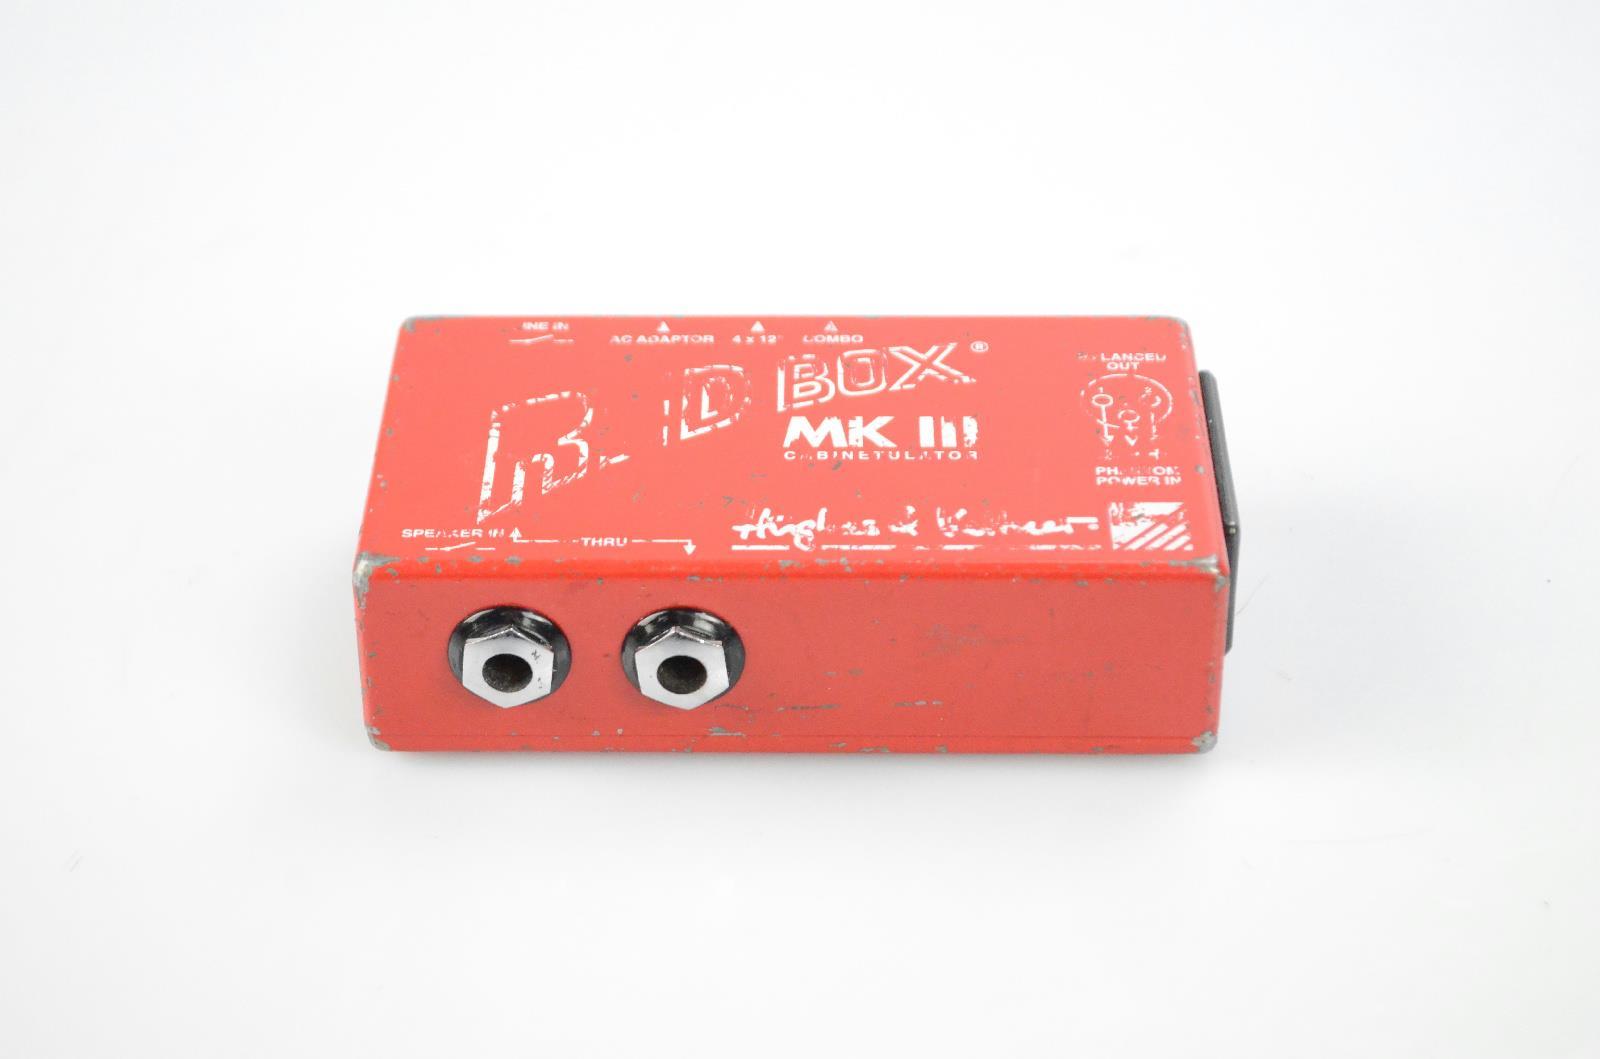 Hughes & Kettner Red Box MK III DI Direct Box Tim Skold Marilyn Manson #34022